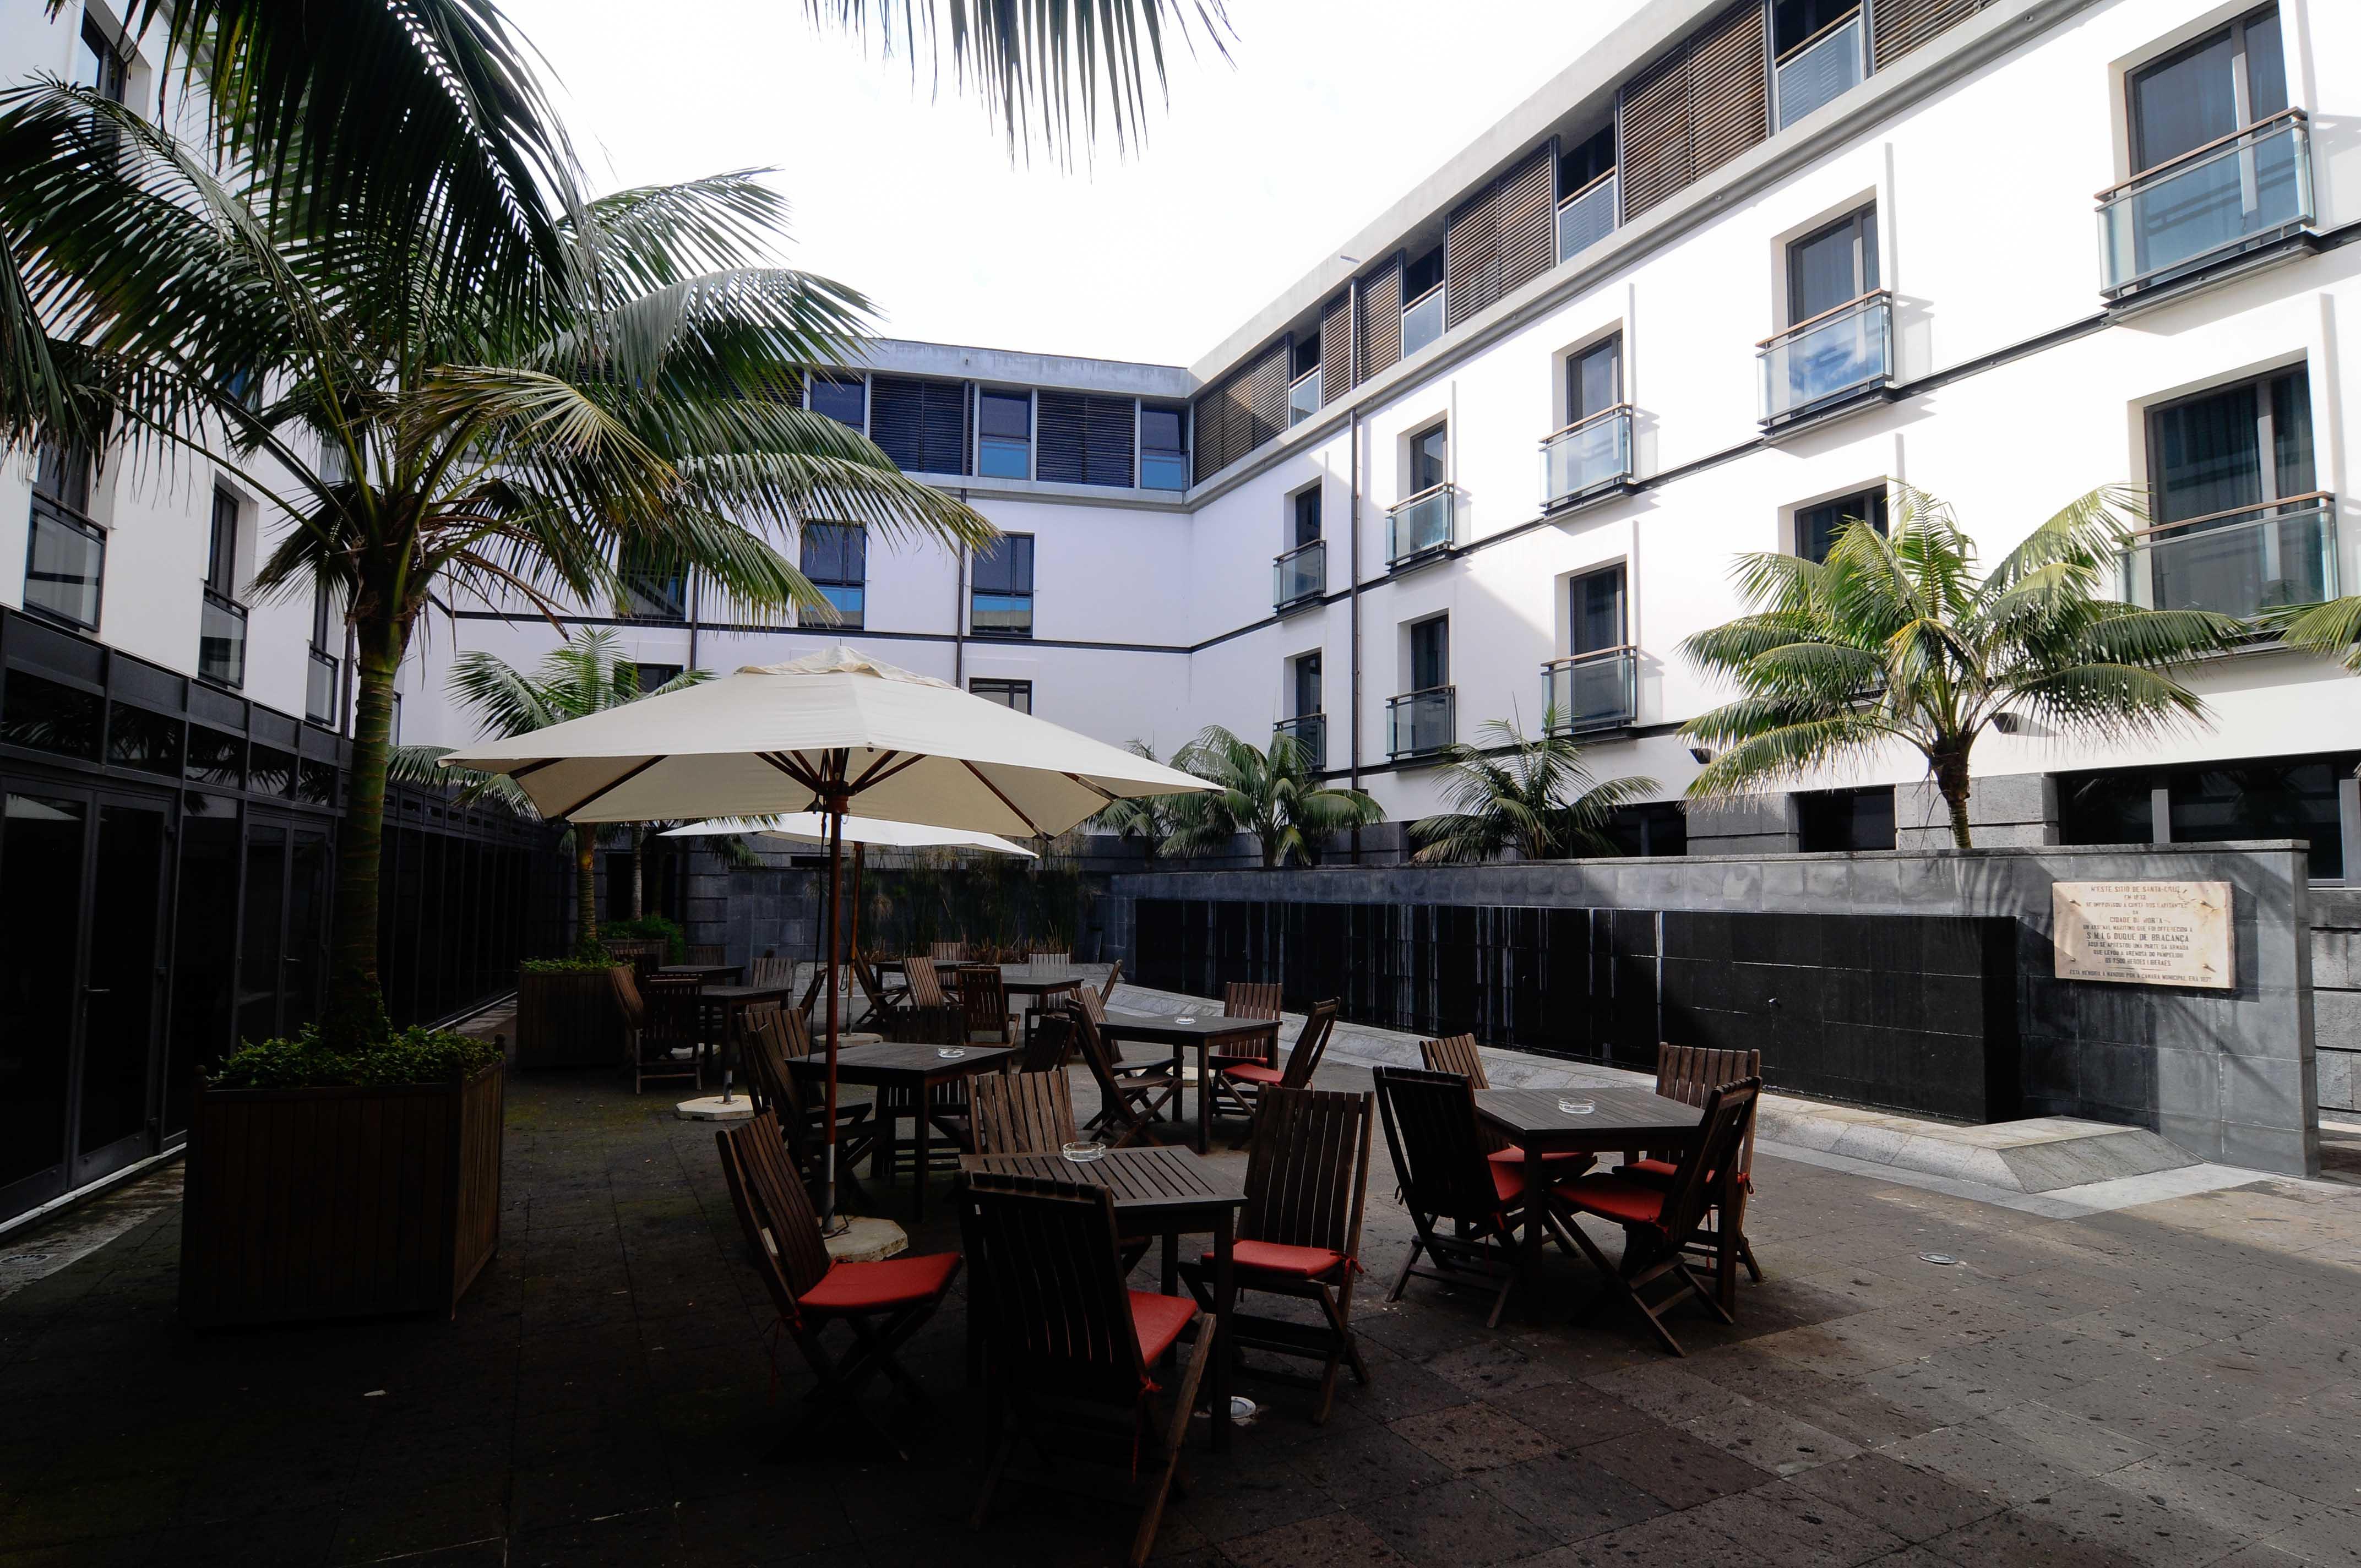 Hotel do Canal_Innenhof